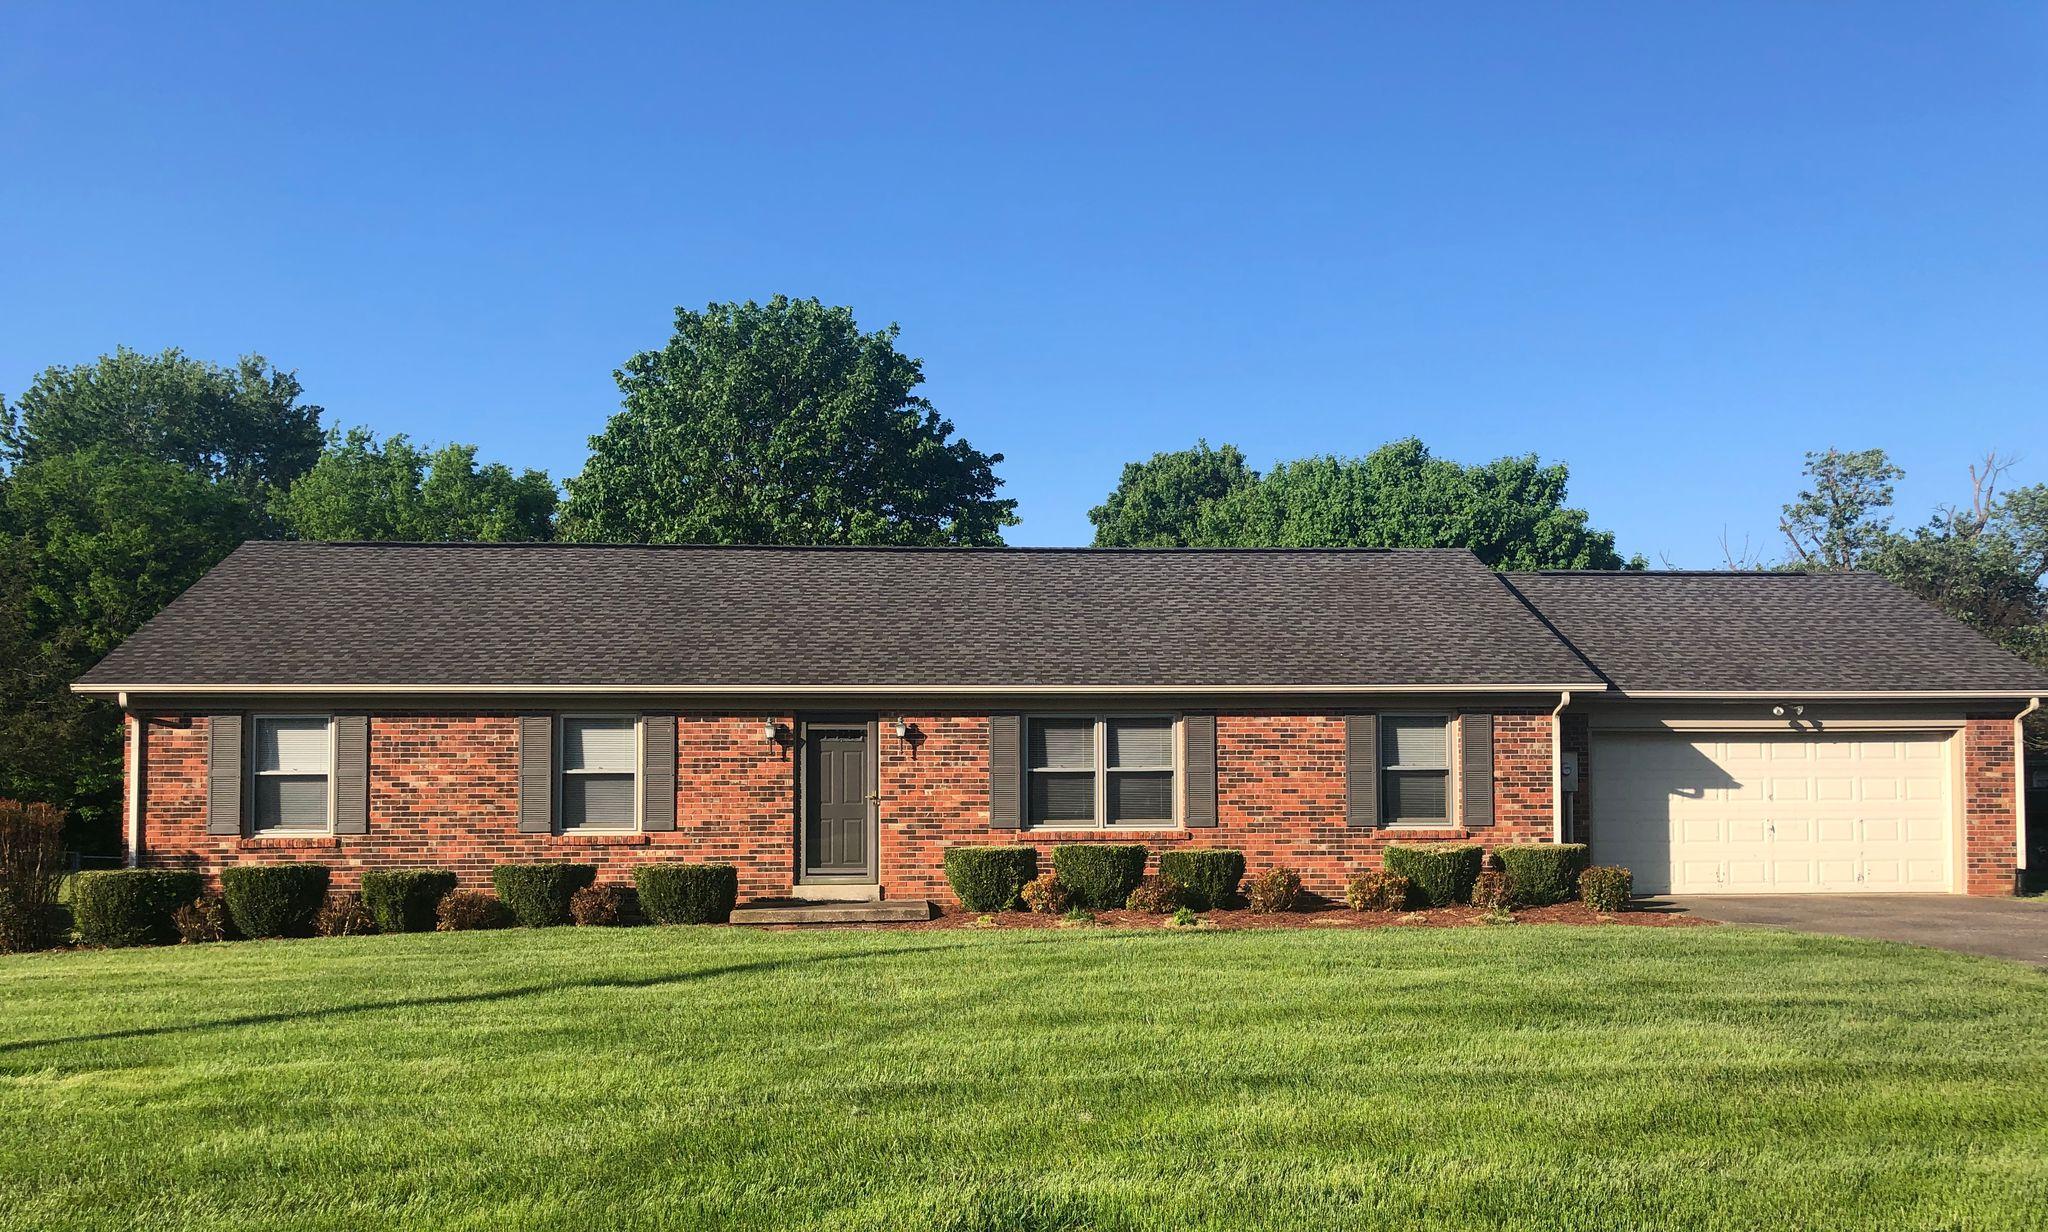 1228 Fox Hollow Ct, Bowling Green, KY 42104 - 3 Bed, 2 Bath Single-Family  Home - 25 Photos | Trulia